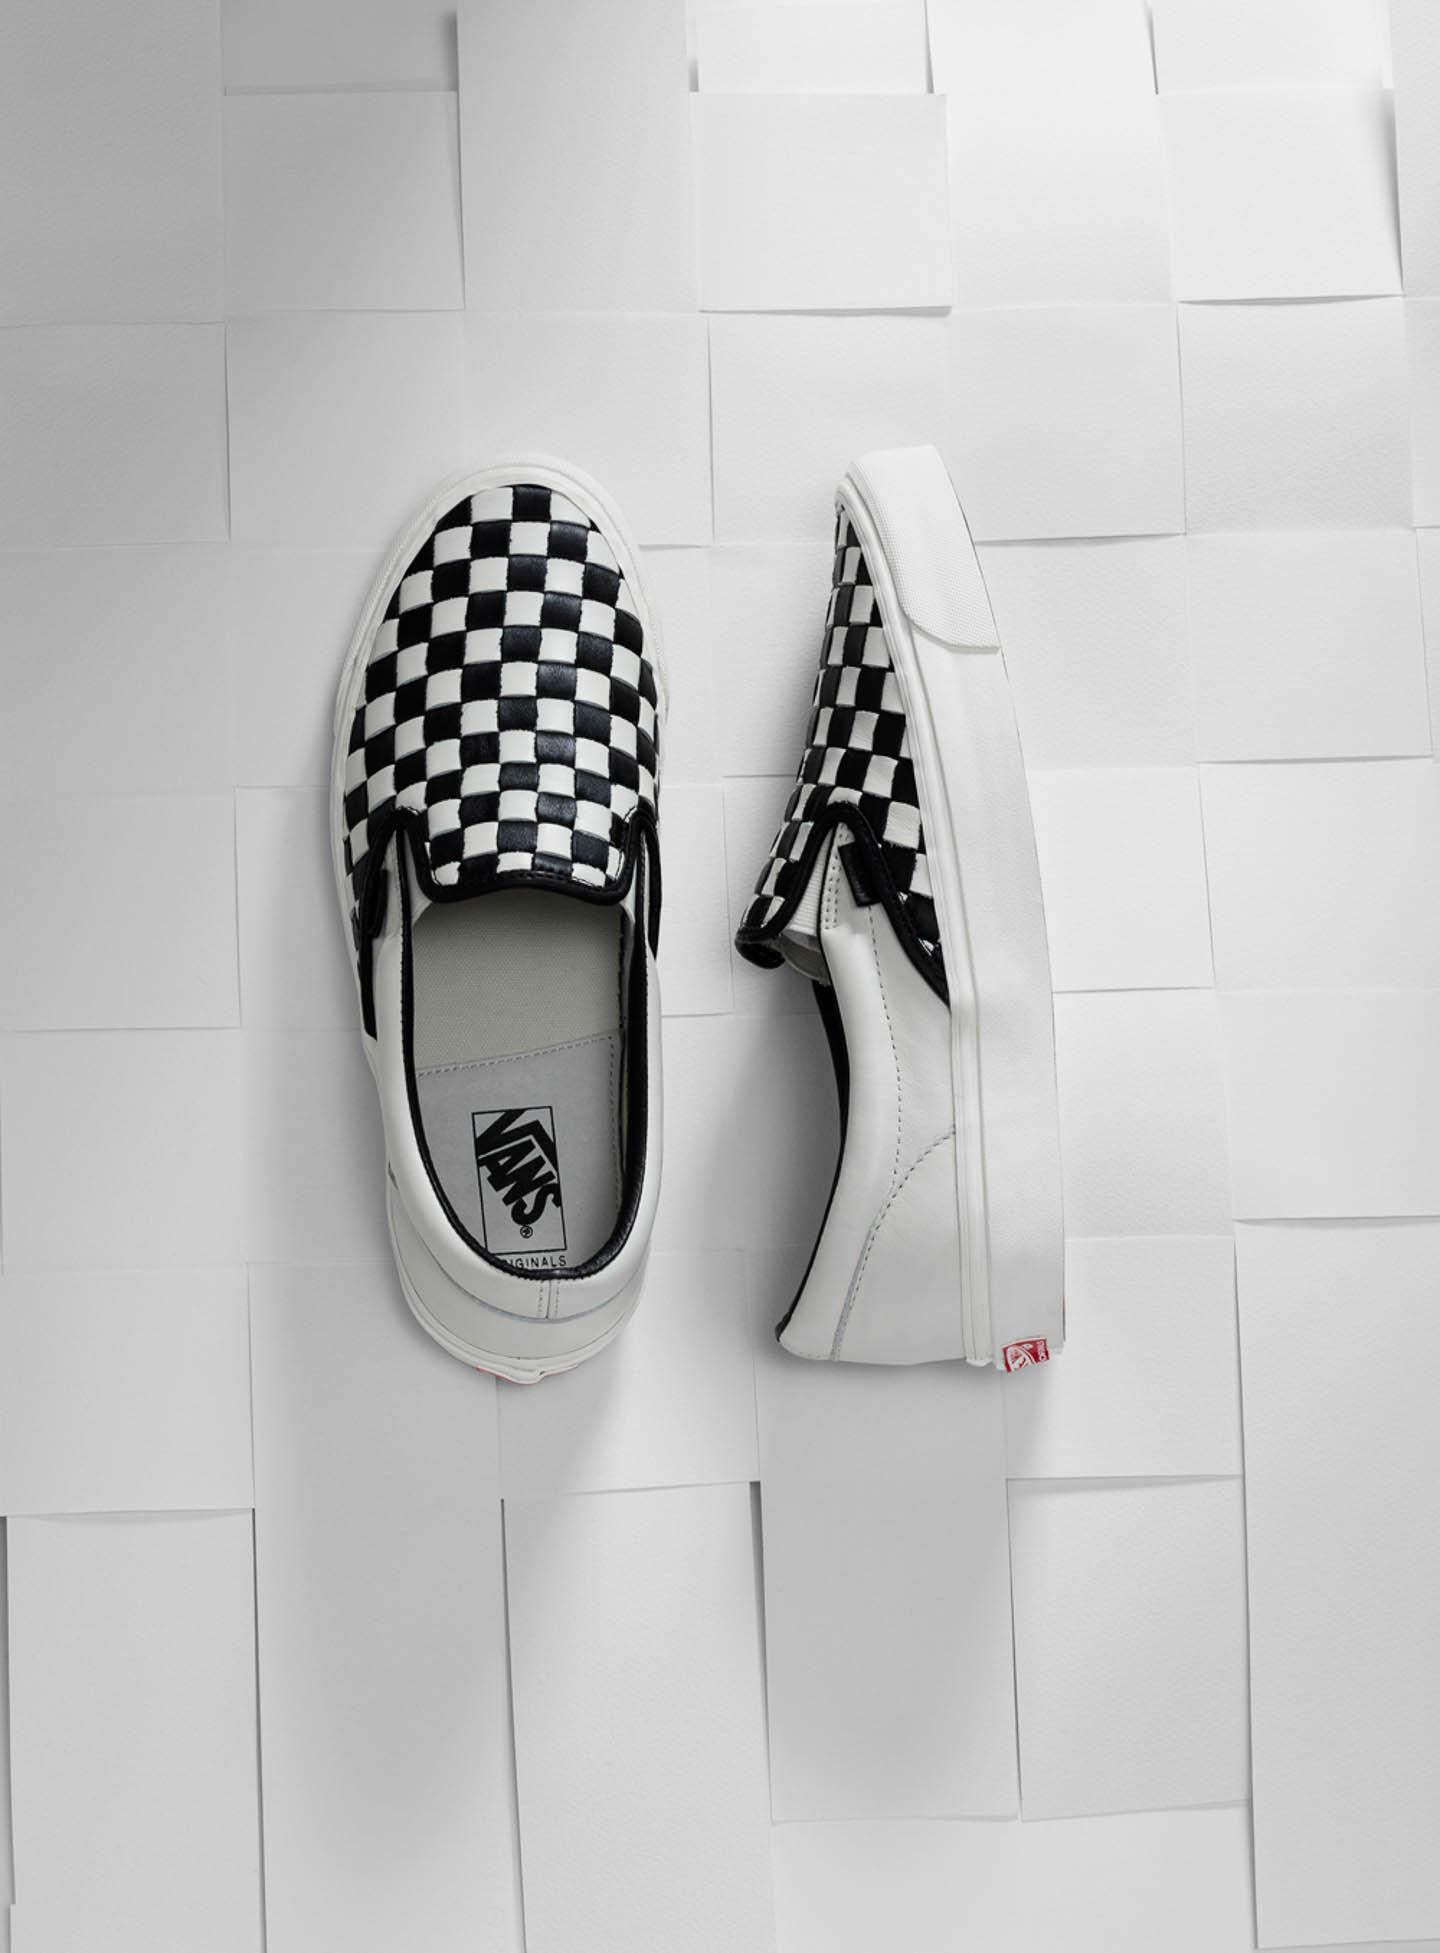 56d95e6cfa Vault by Vans reinterpreta il classico motivo Checkerboard - Surf ...